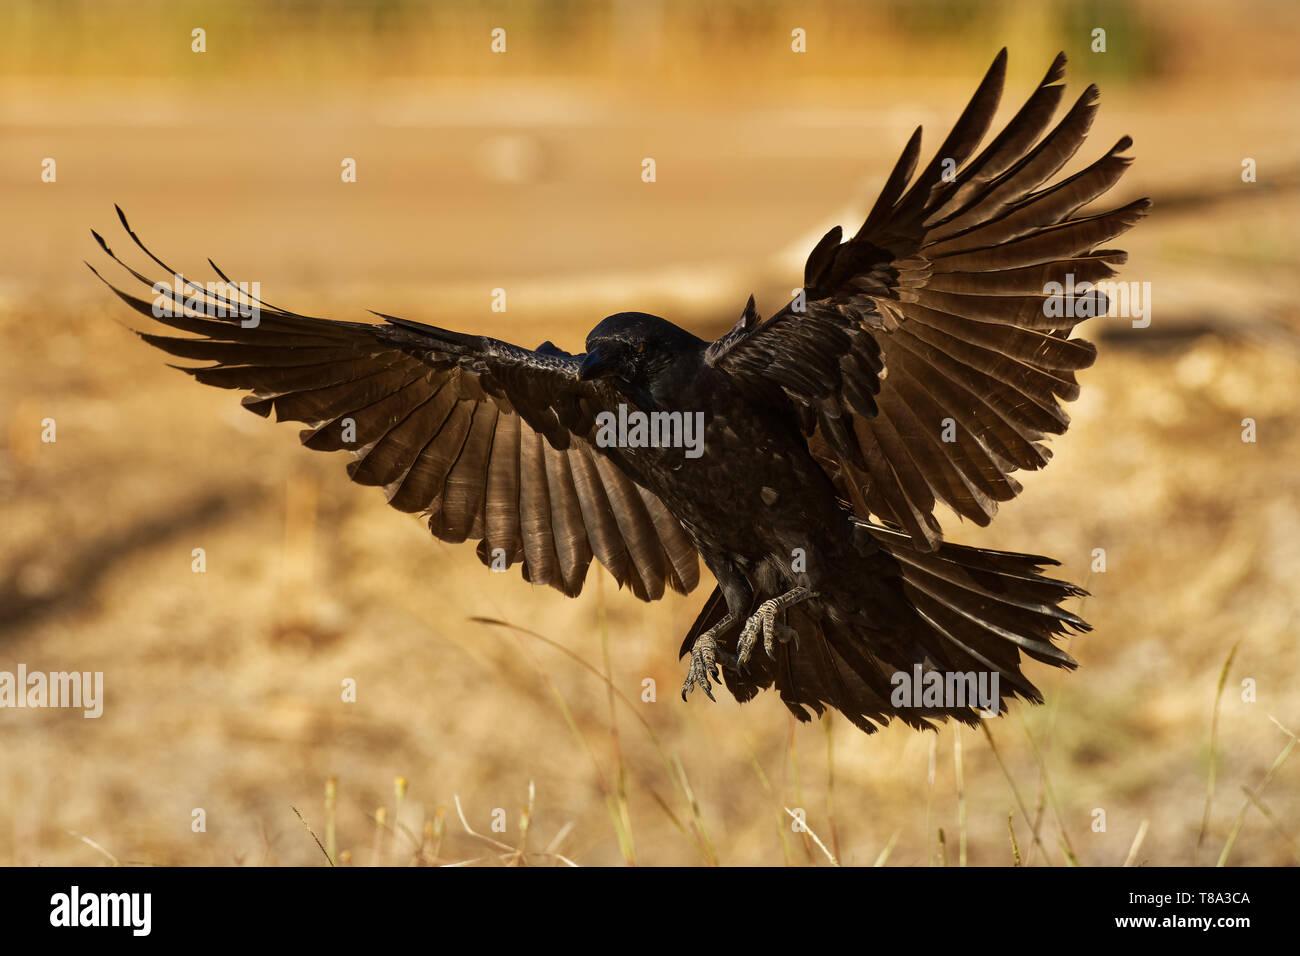 Australian Raven - Corvus coronoides black passerine bird in the genus Corvus native to much of southern and northeastern Australia. - Stock Image